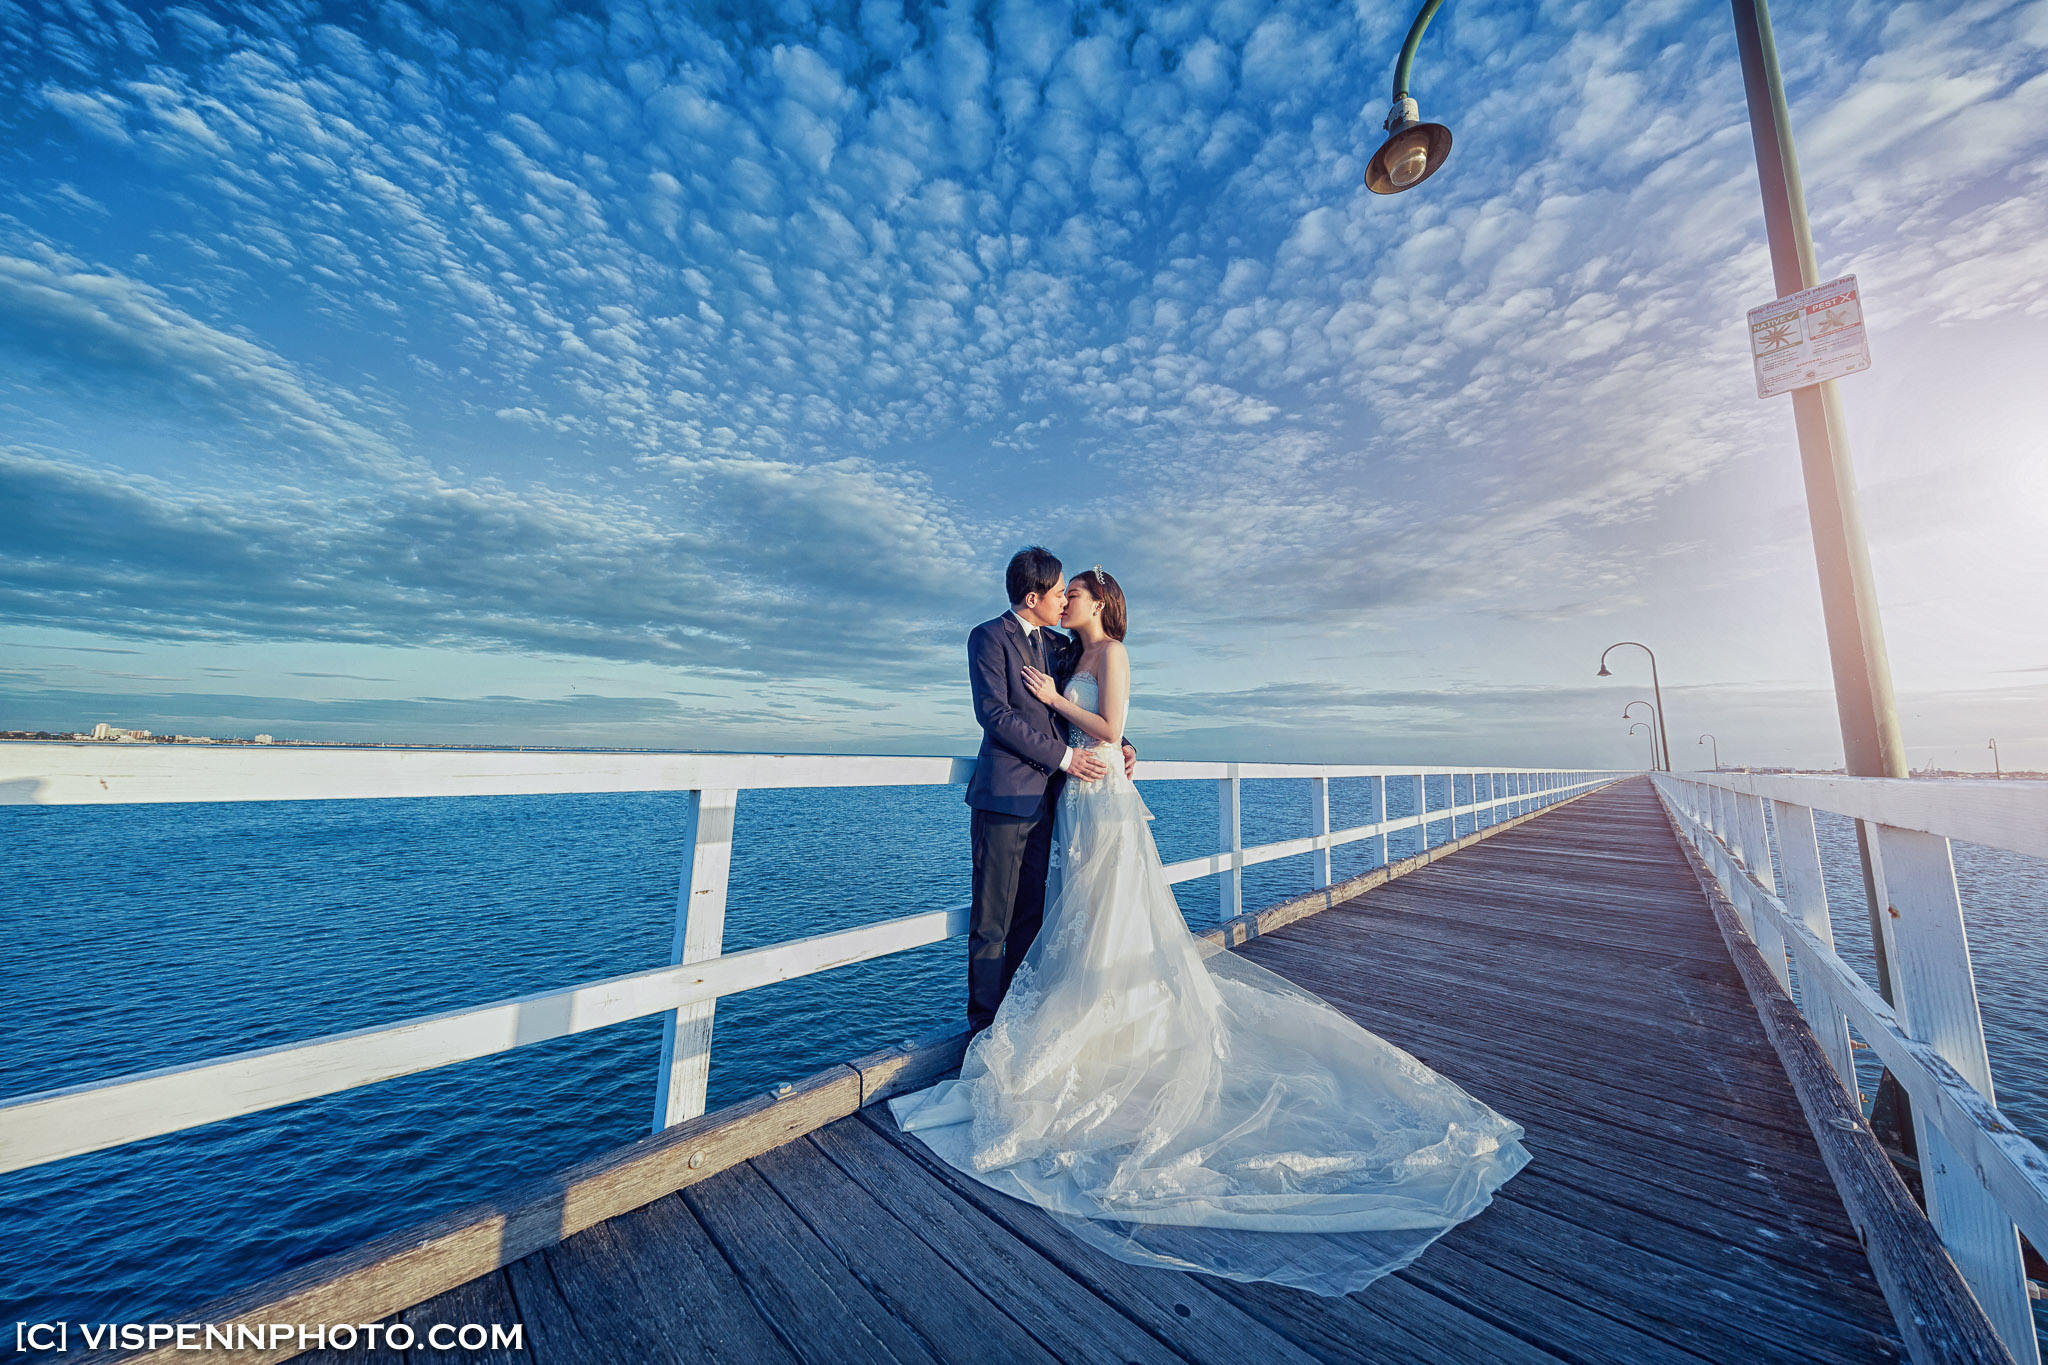 PRE WEDDING Photography Melbourne VISPENN 墨尔本 婚纱照 结婚照 婚纱摄影 VISPENN JackySerena 2214 1 1